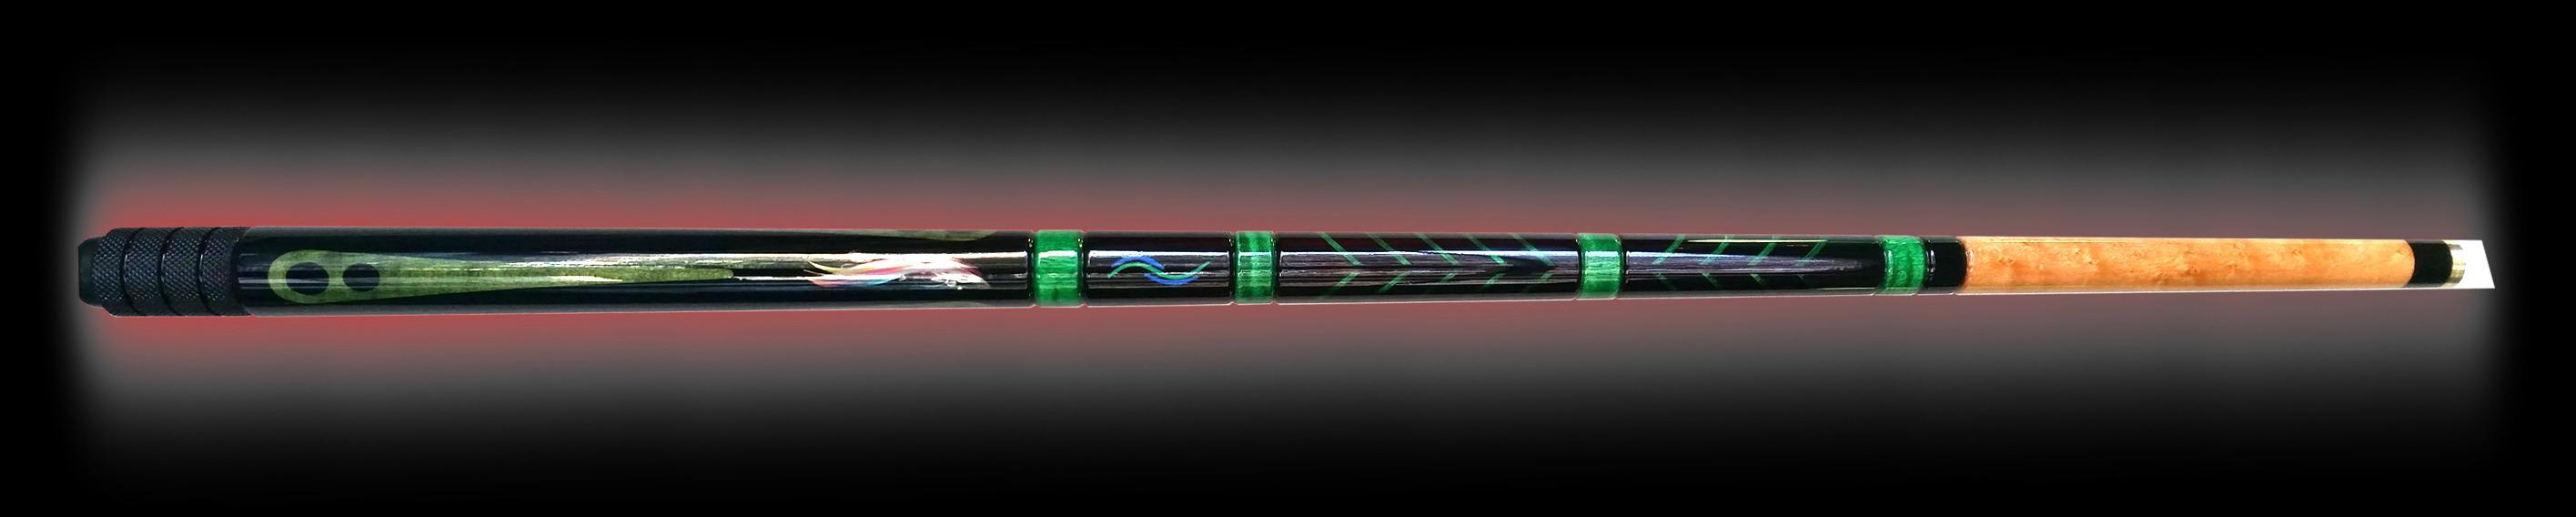 onda-verde-lucida